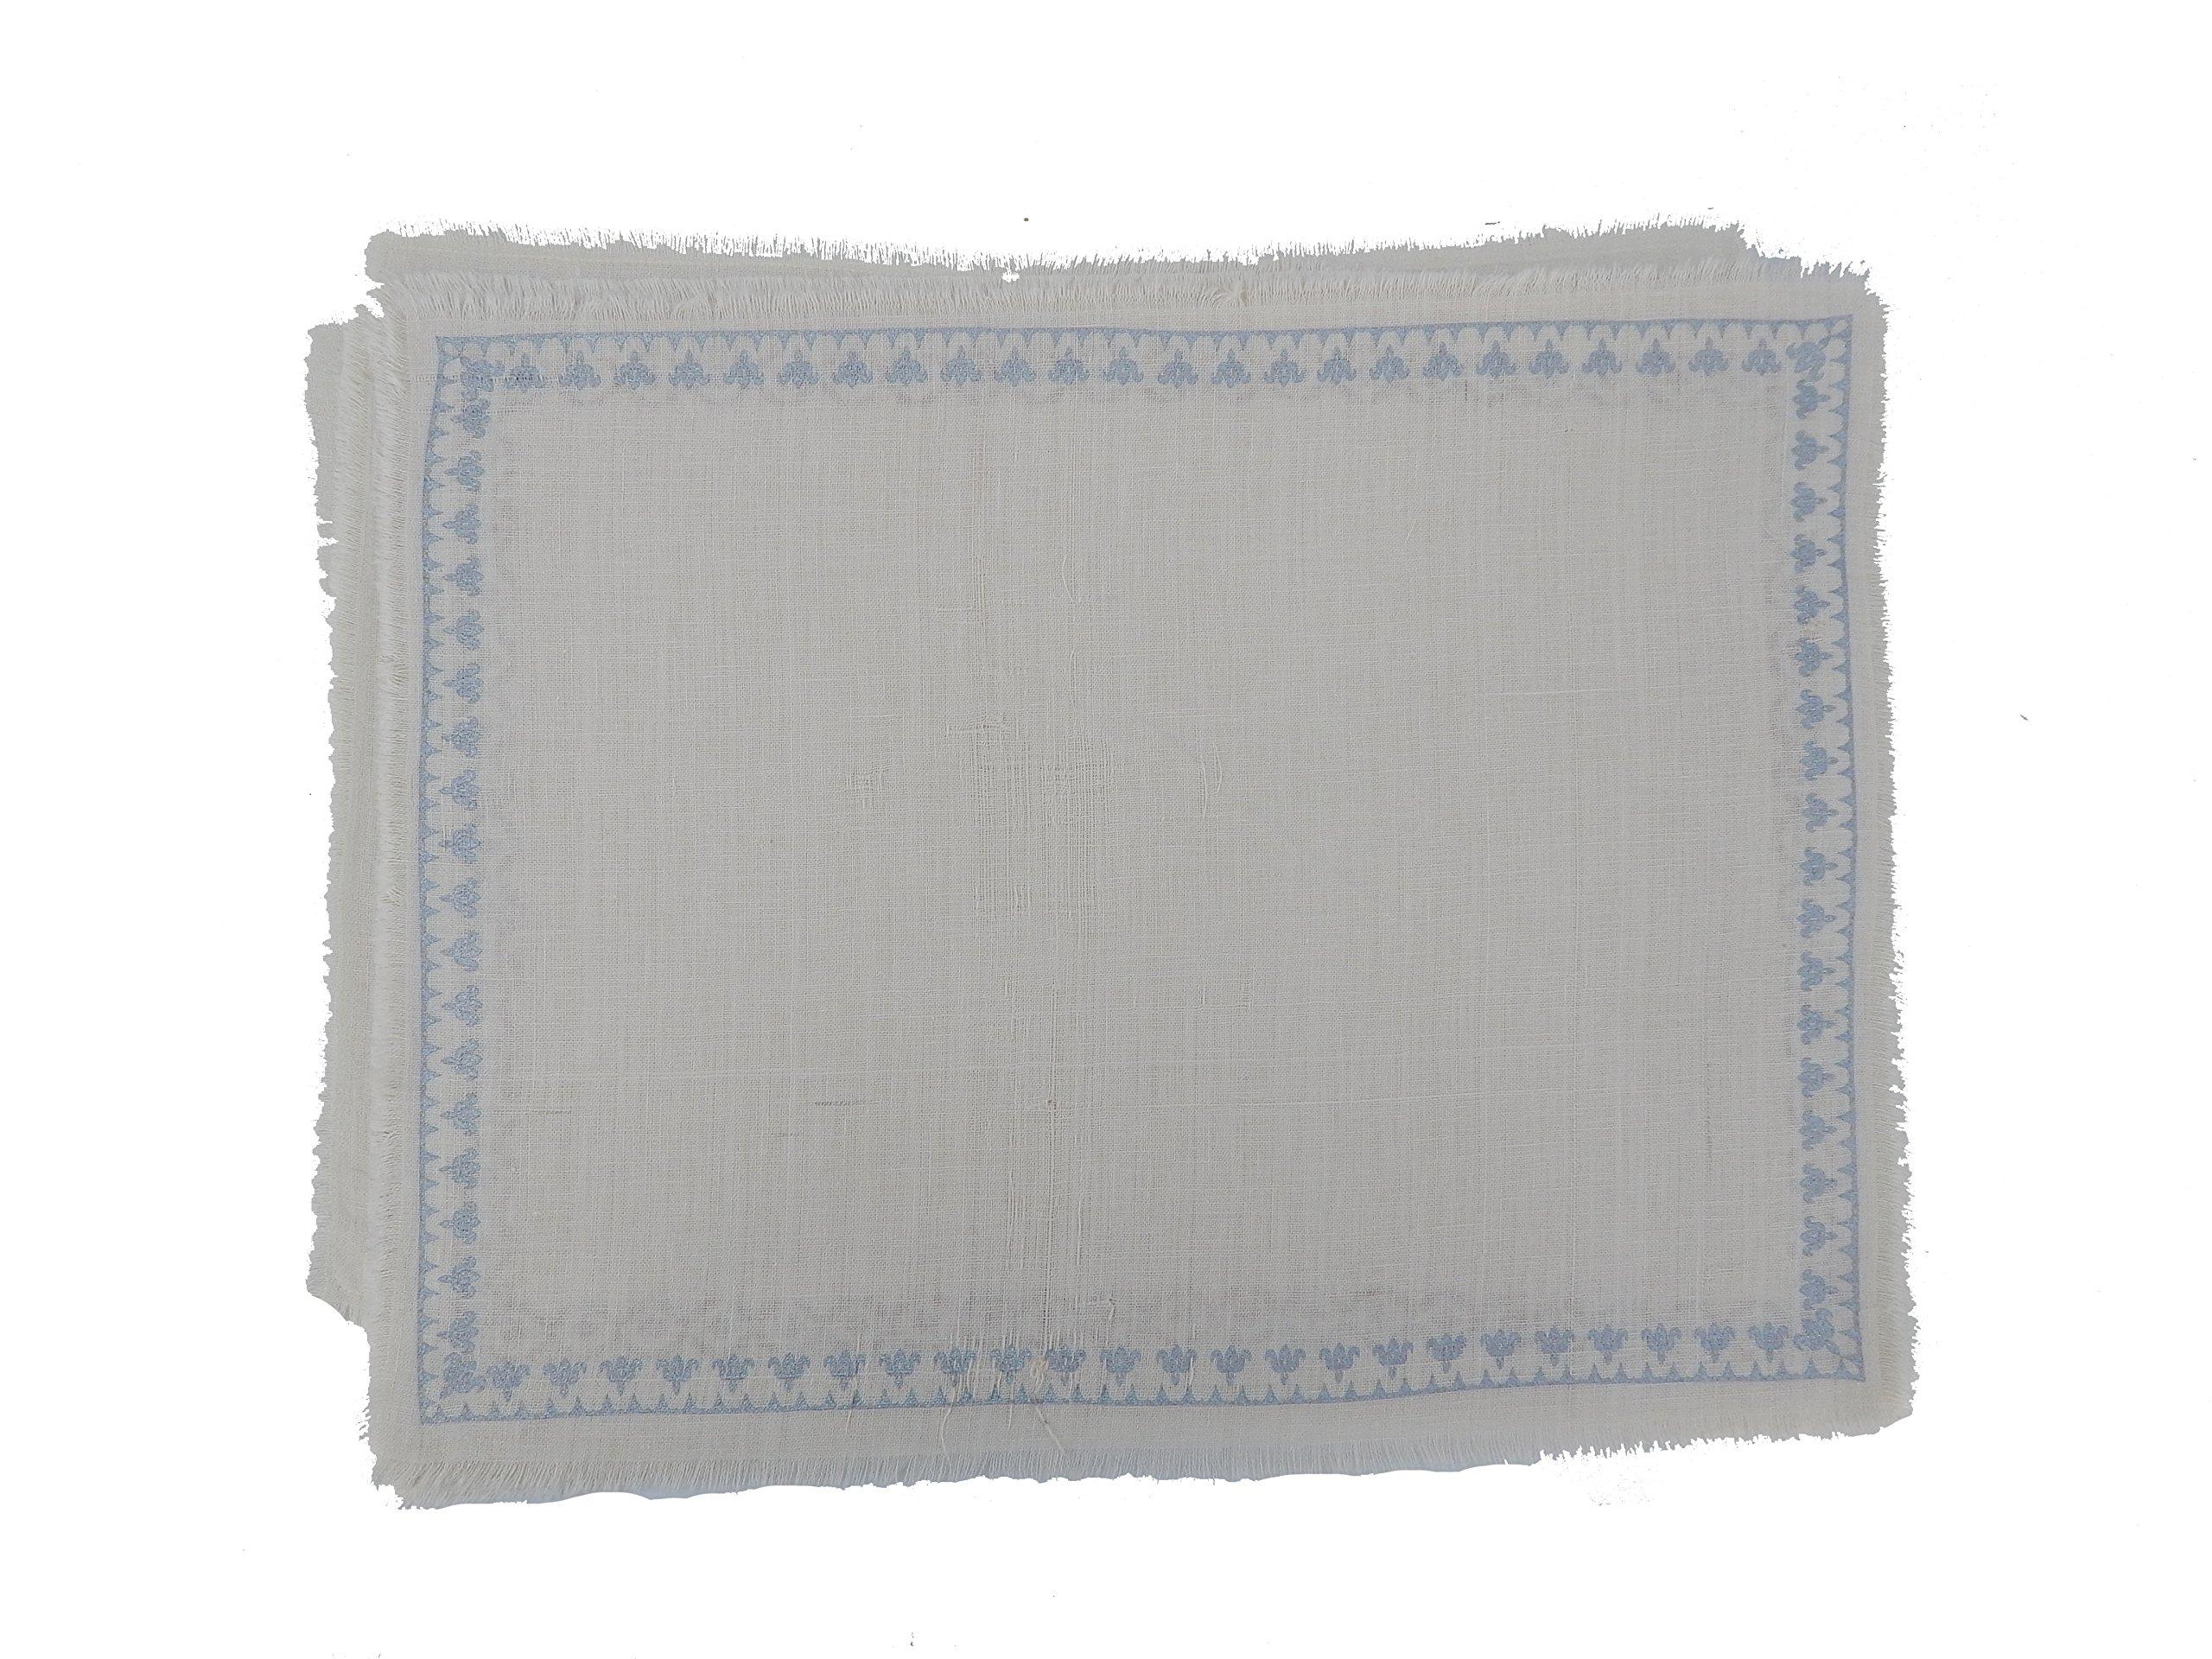 Gitika Goyal Home Cotton Khadi Silver Hand Block Printed Flower Border Design Mat (Set of 4), 13 by 17 '', Cream by Gitika Goyal Home